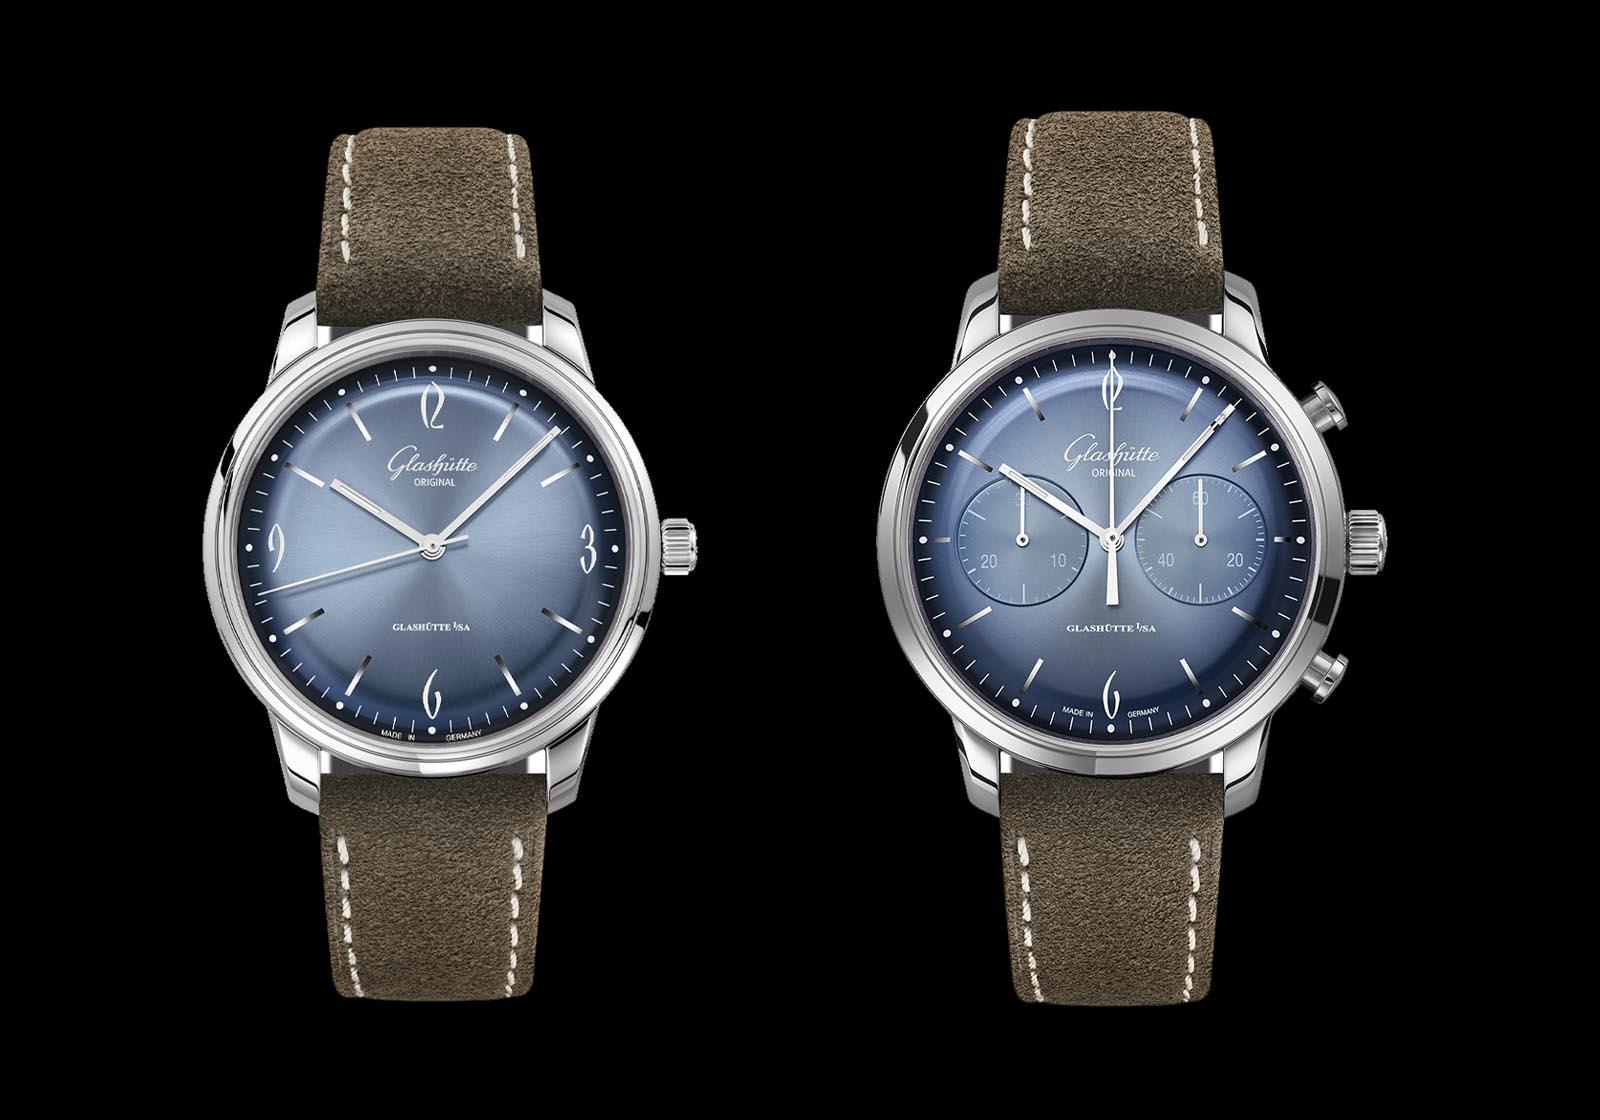 VIDEO: The Top 10 watches of Virtual Baselworld 2020, inc. Hublot, Longines, Seiko, Casio and Hamilton